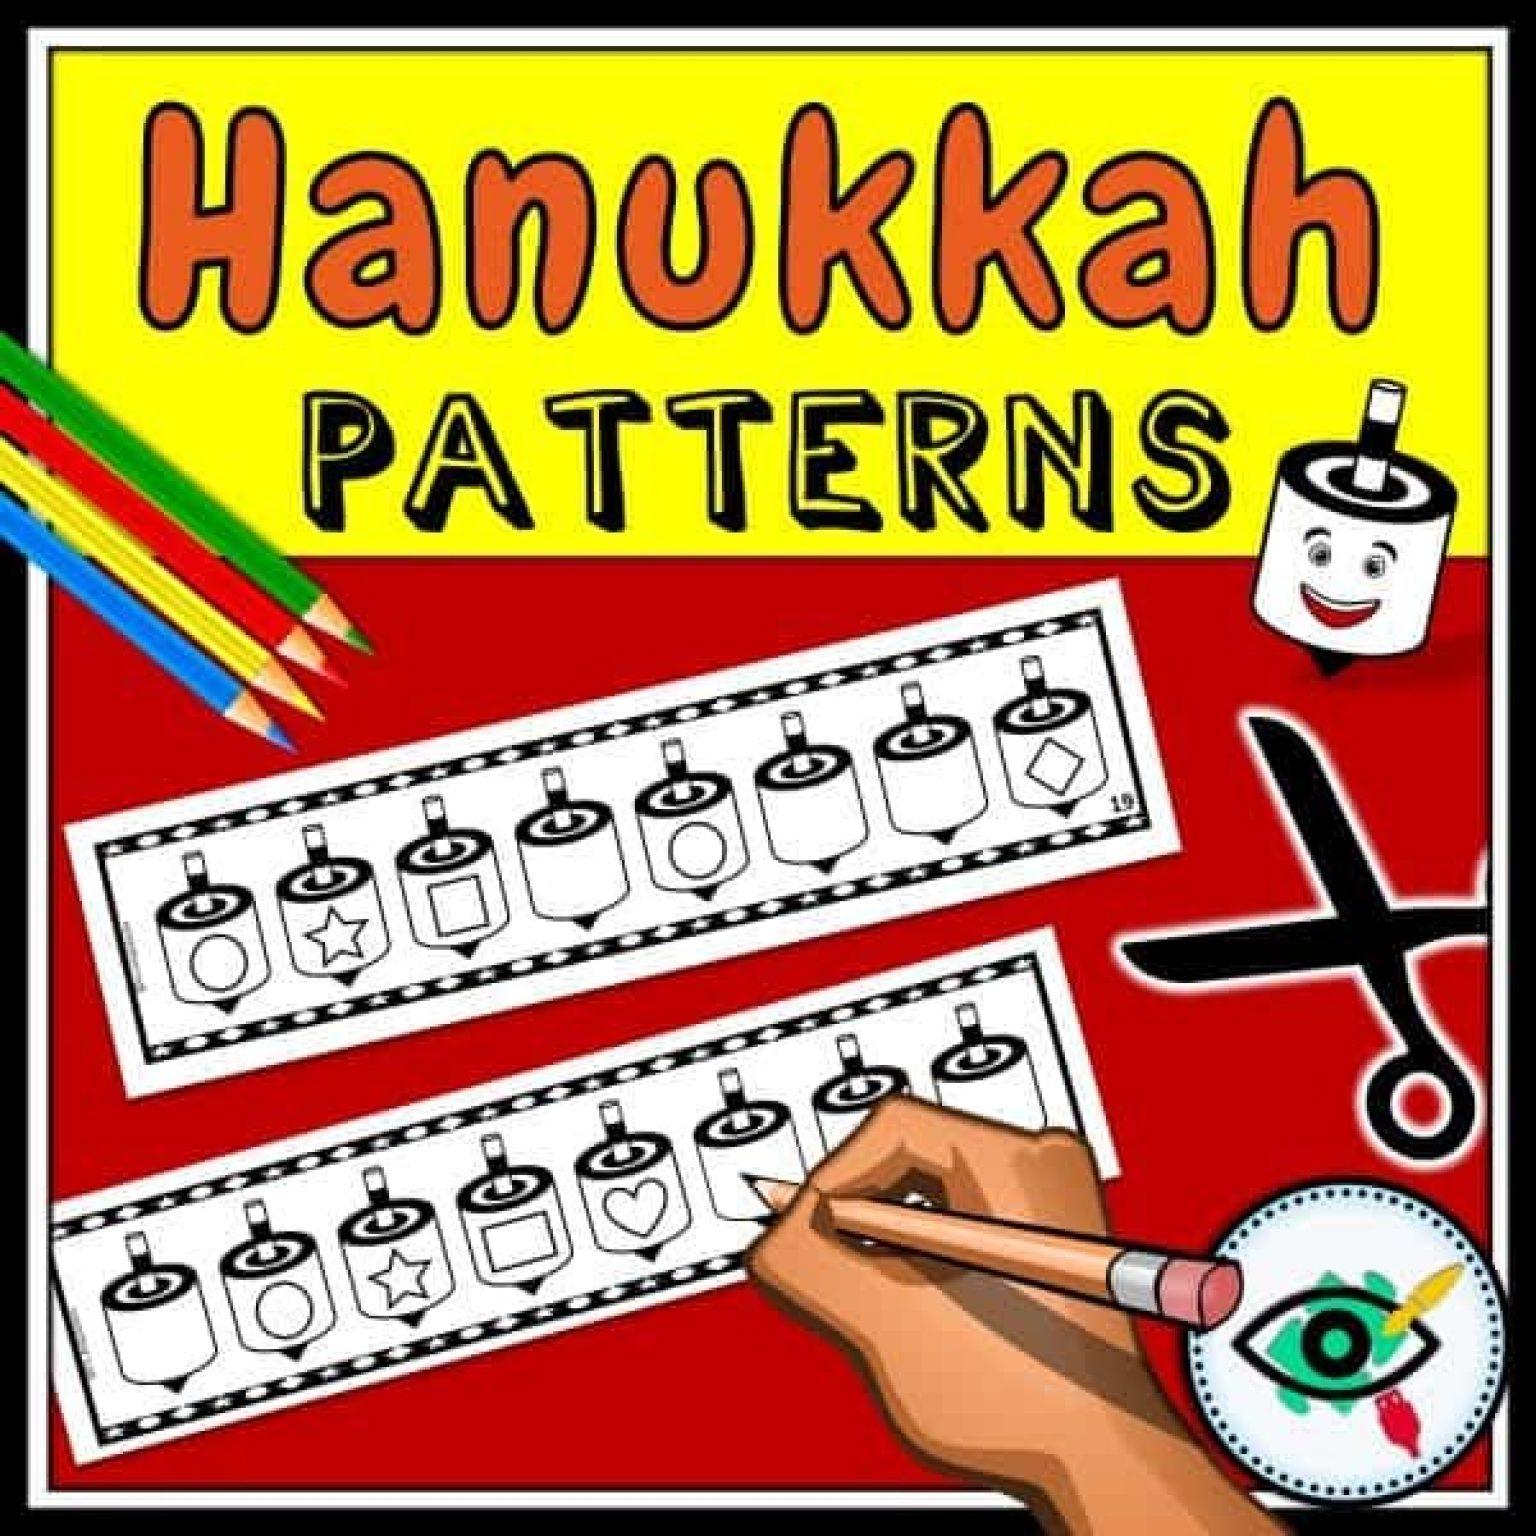 holiday-hanukkah-dreidel-shape-patterns-title3